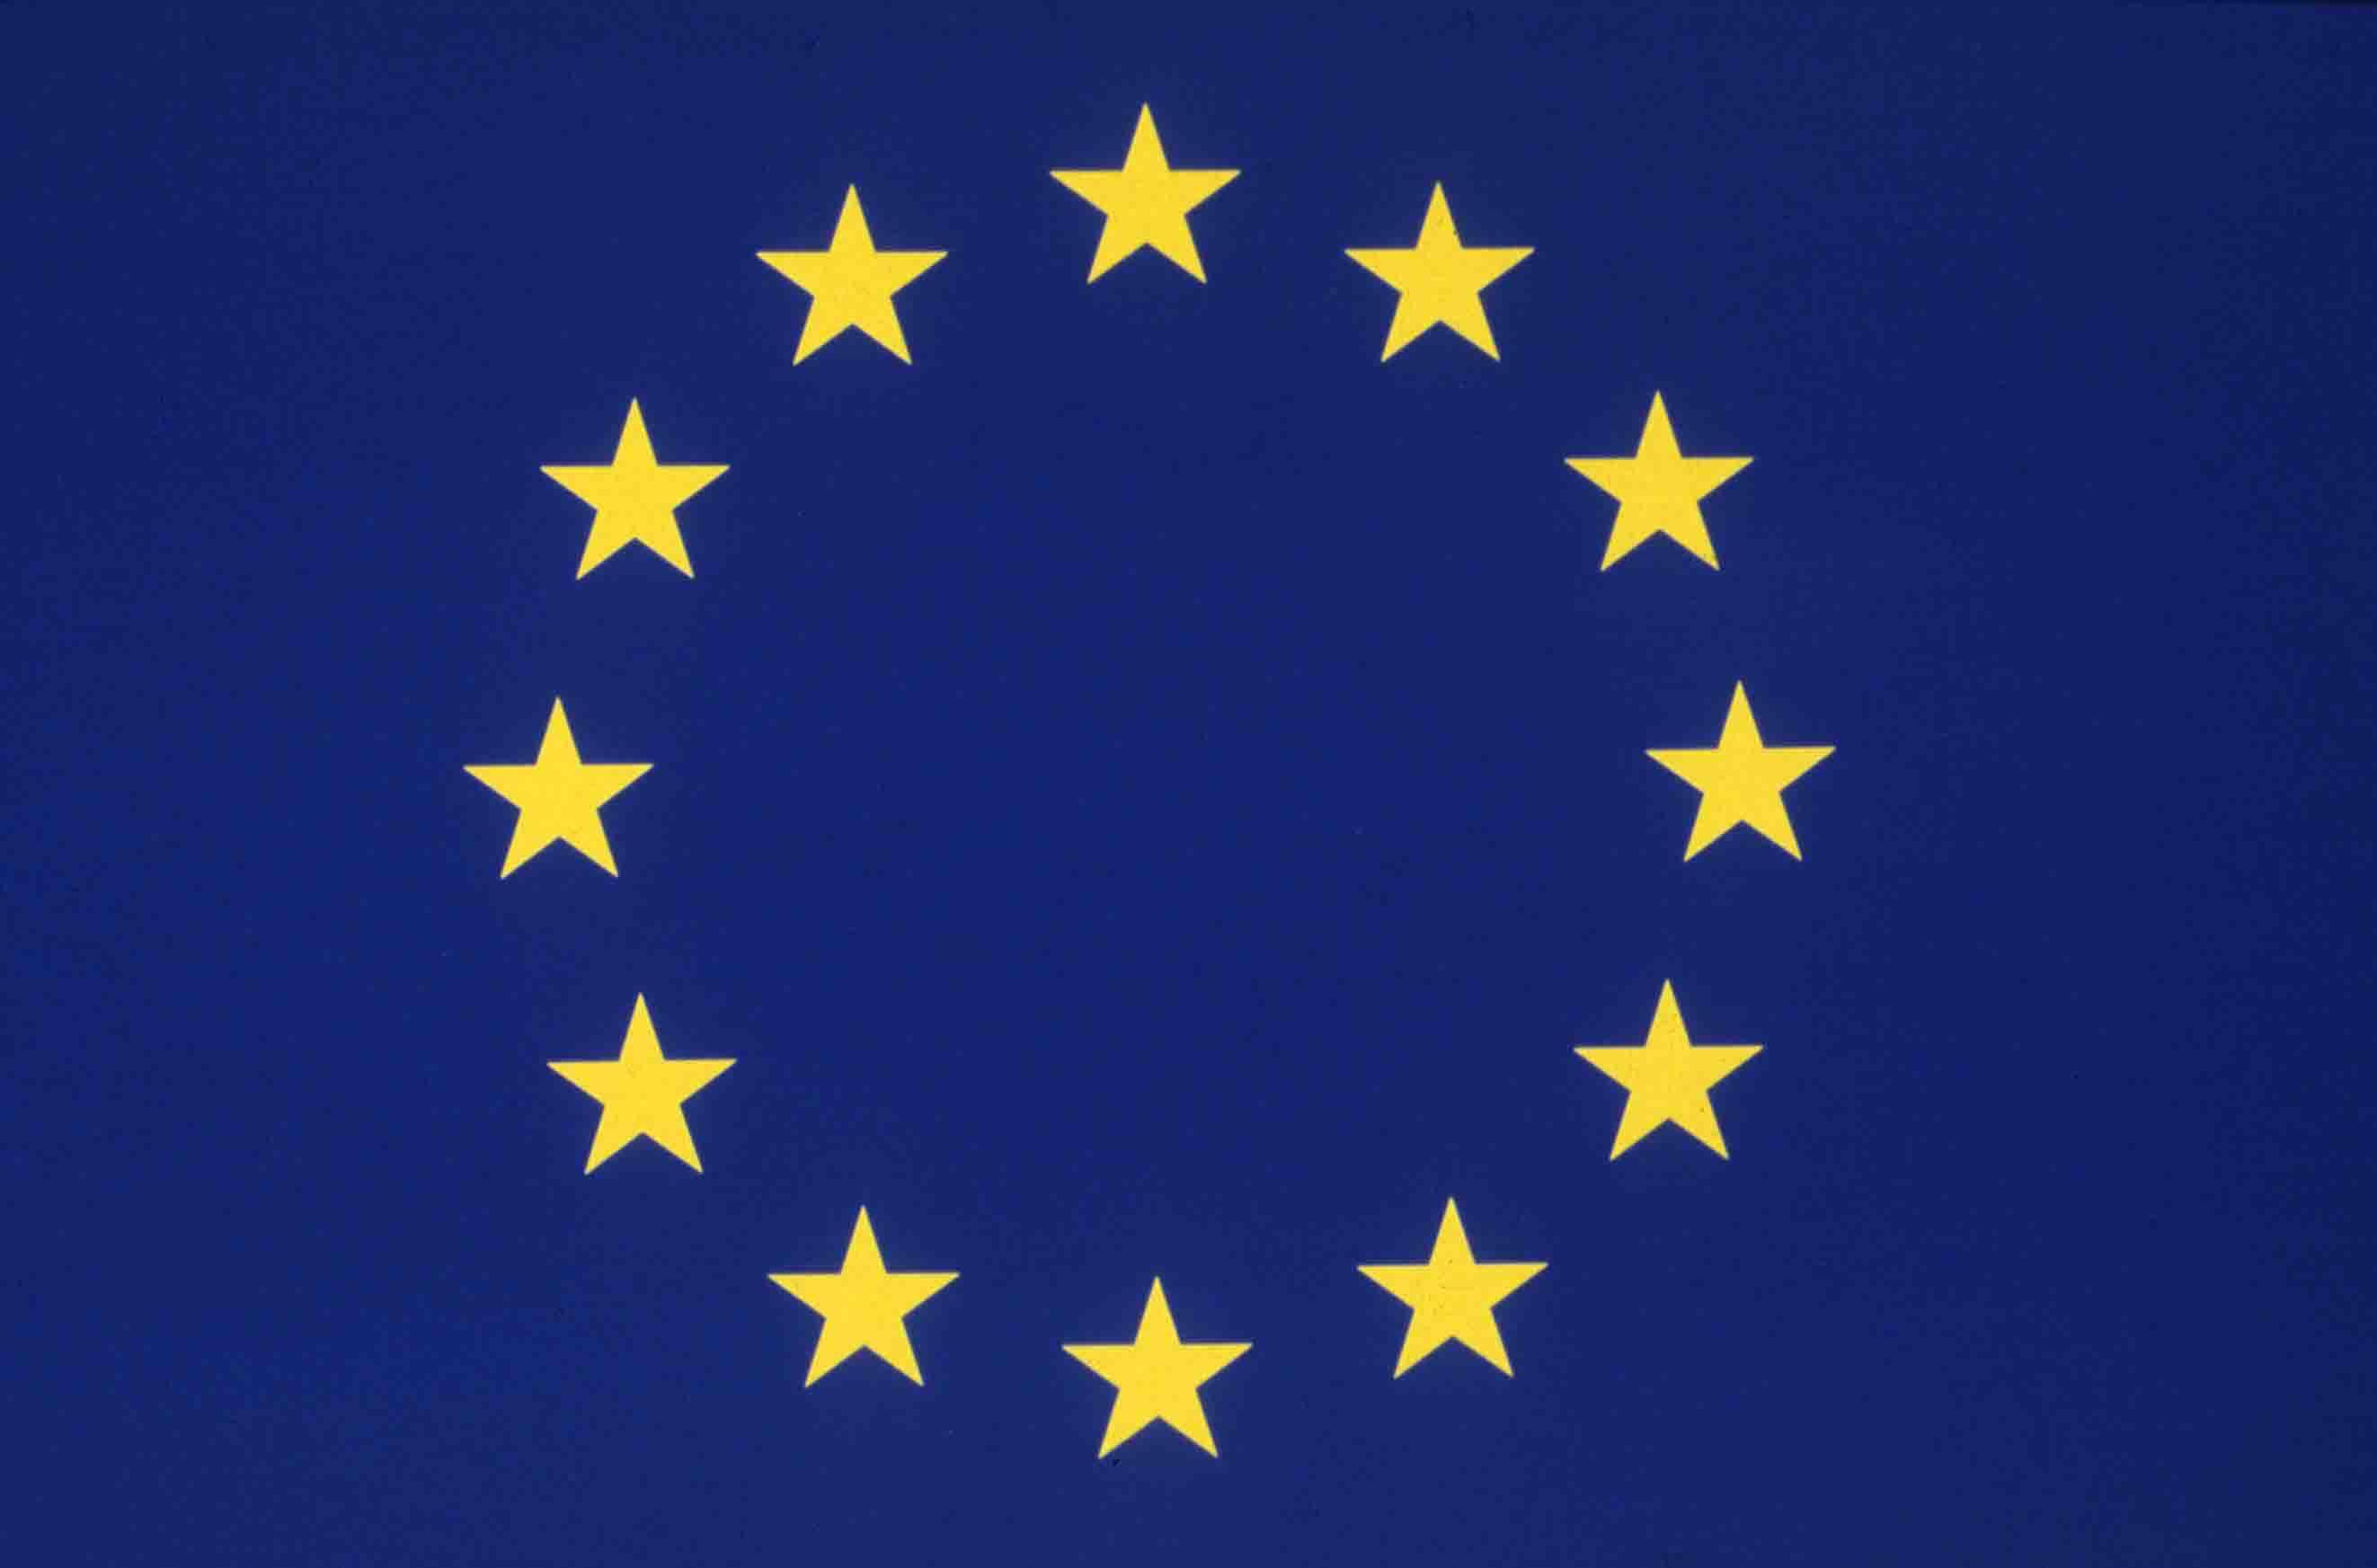 http://logos.caponis.gr/wp-content/uploads/2010/06/european_flag.jpg